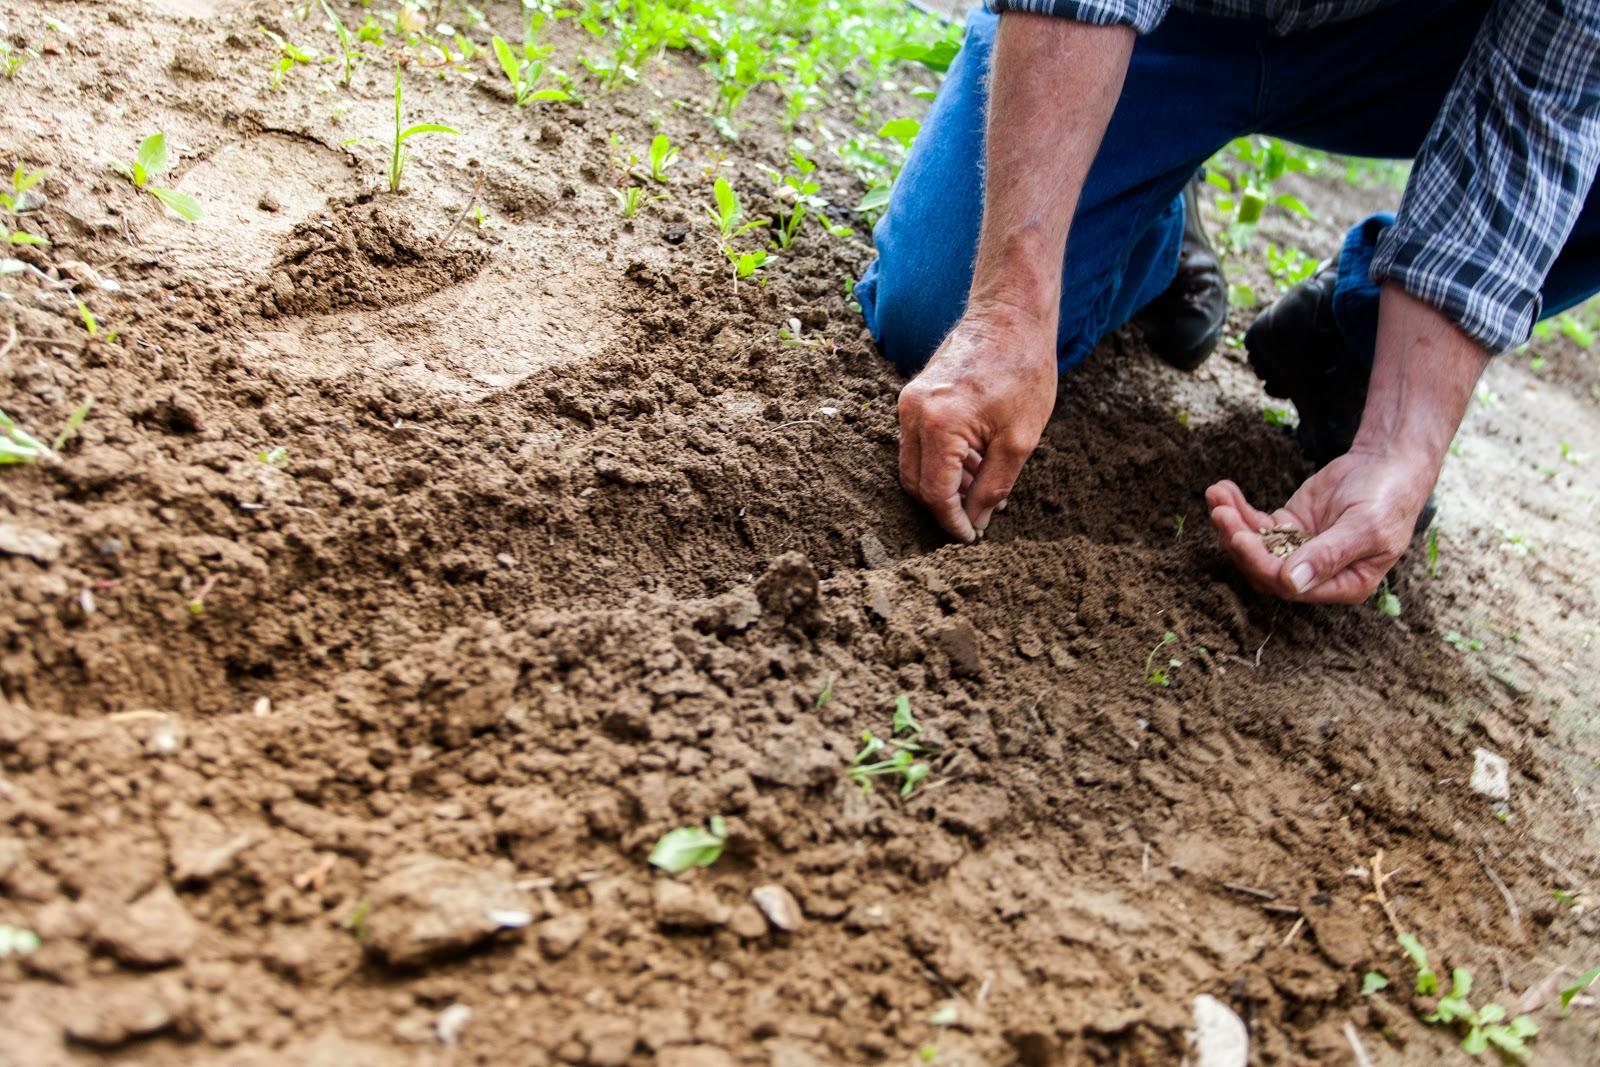 farmer planting crops on soil